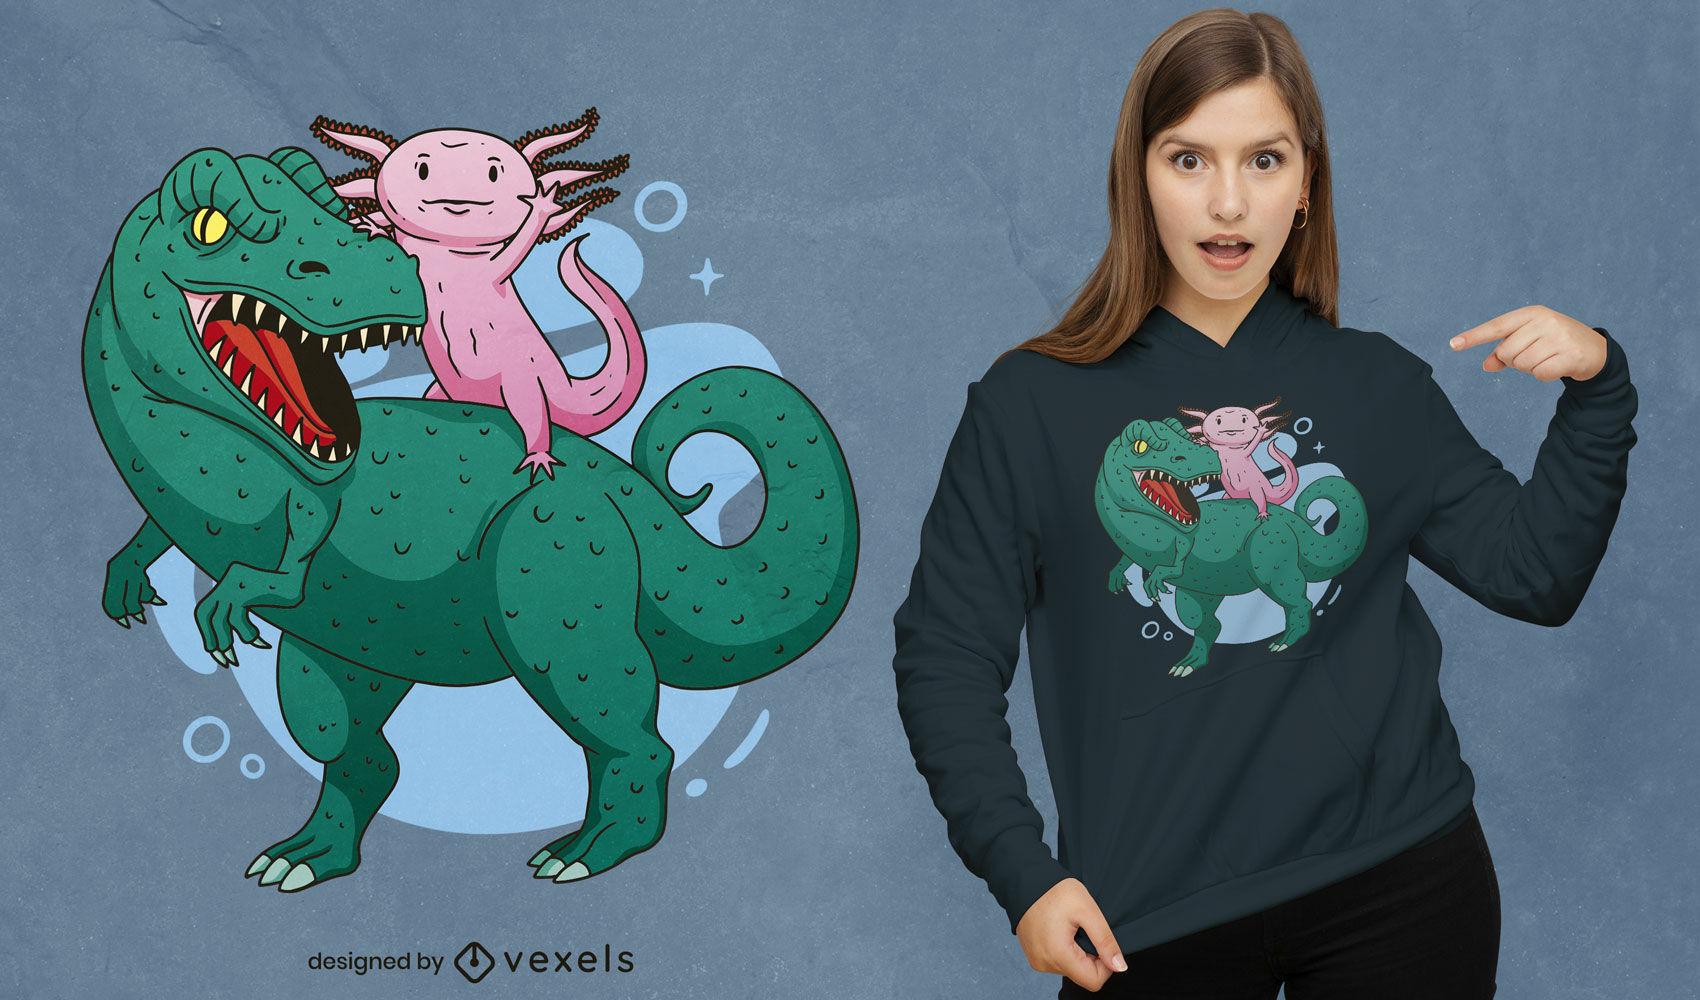 Genial dise?o de camiseta de axolotl y t-rex